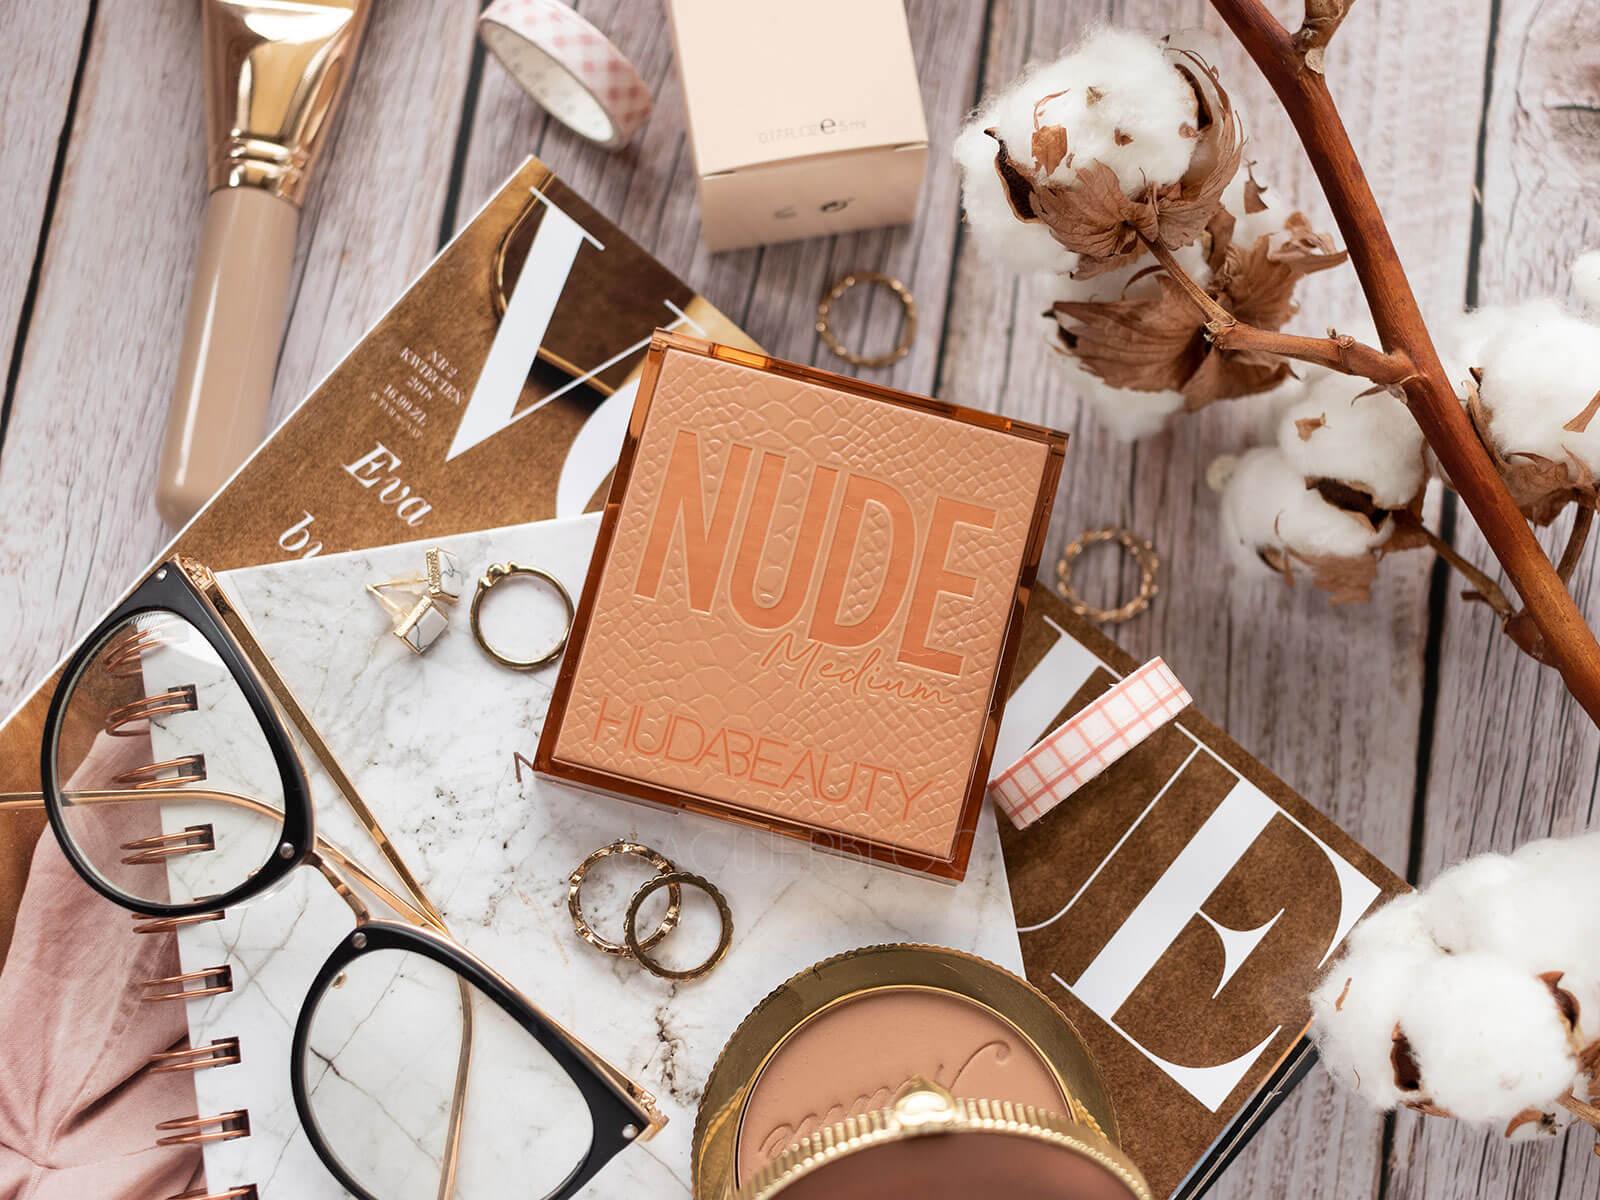 Huda Beauty Medium Nude Obsession